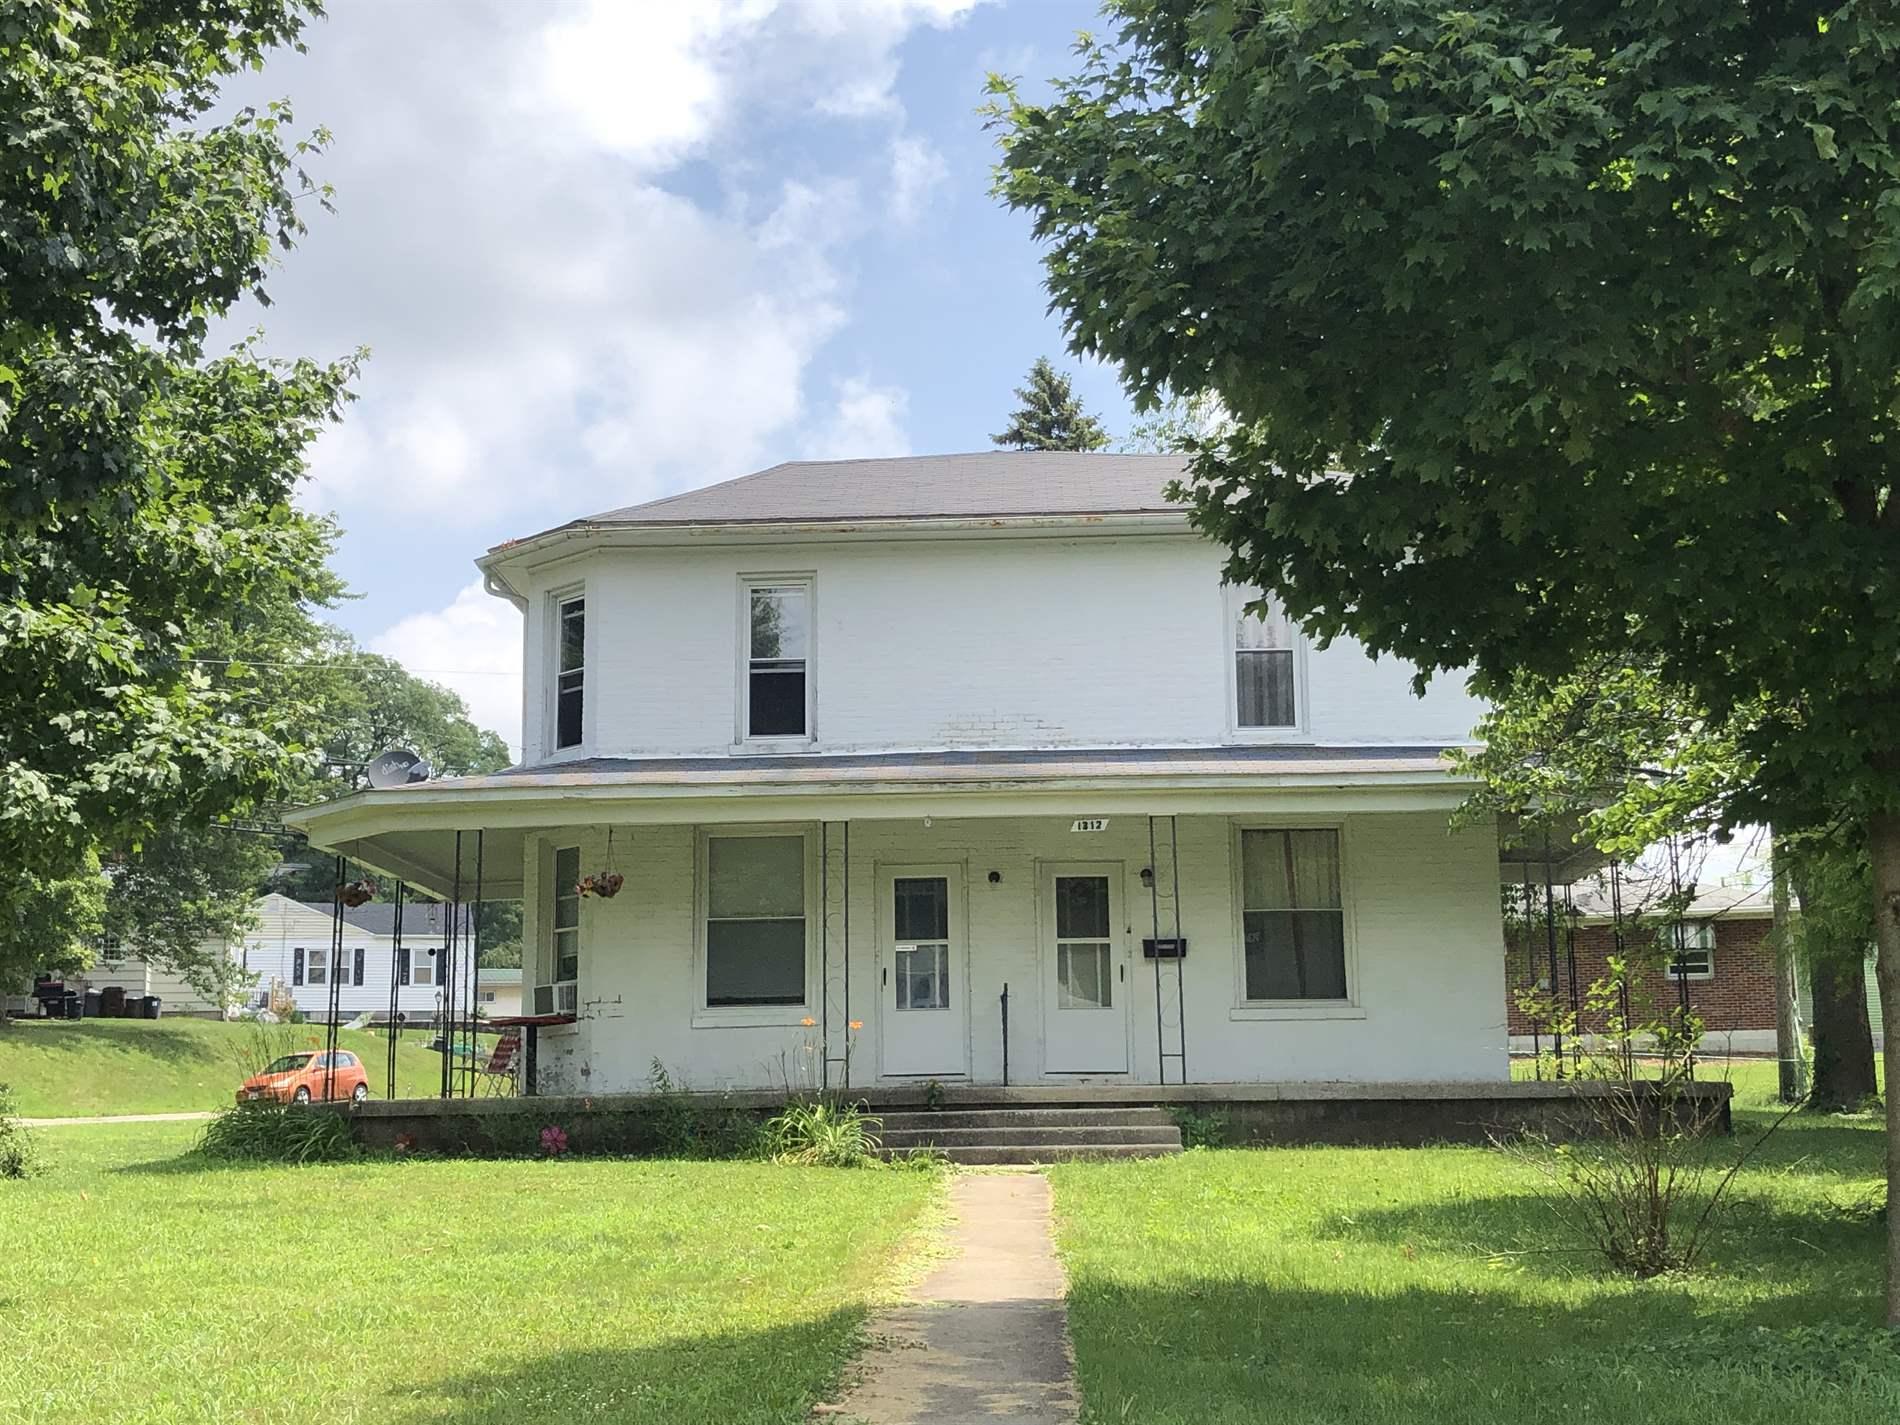 1310-1312 Selma Road, Springfield, OH 45505